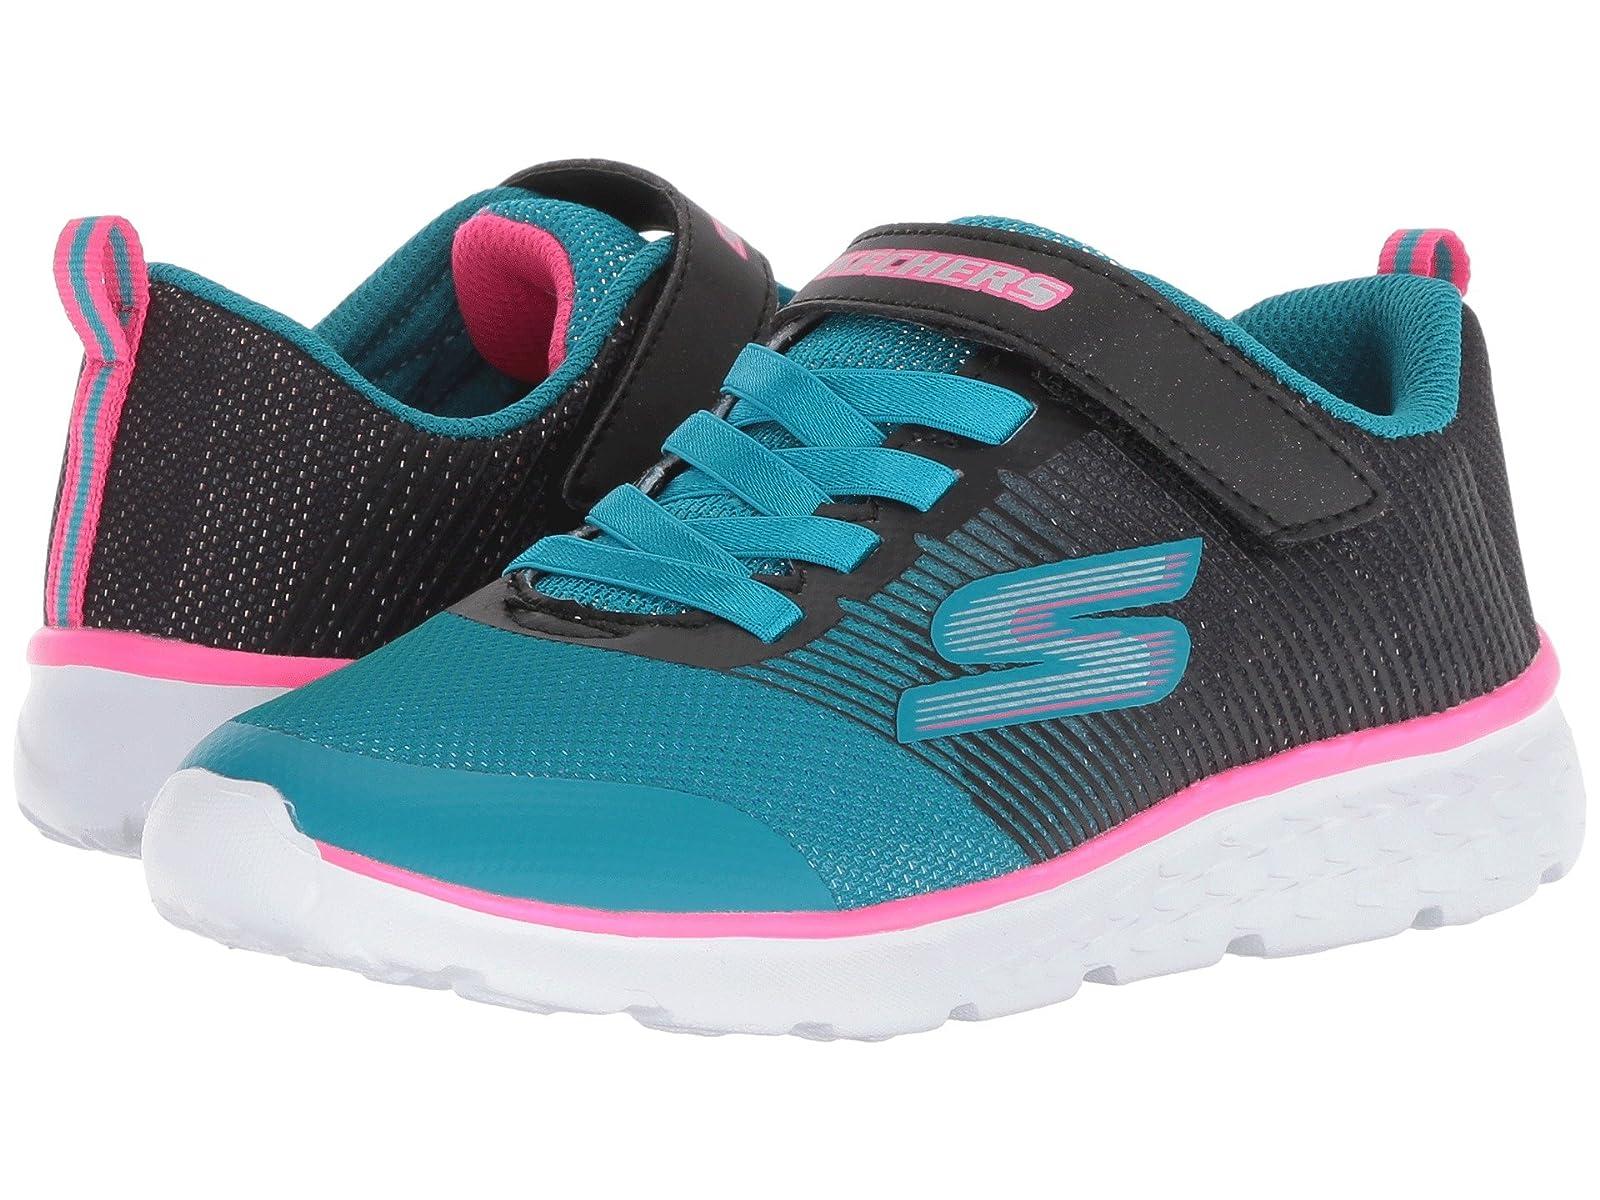 SKECHERS KIDS Go Run 400 (Little Kid/Big Kid)Cheap and distinctive eye-catching shoes